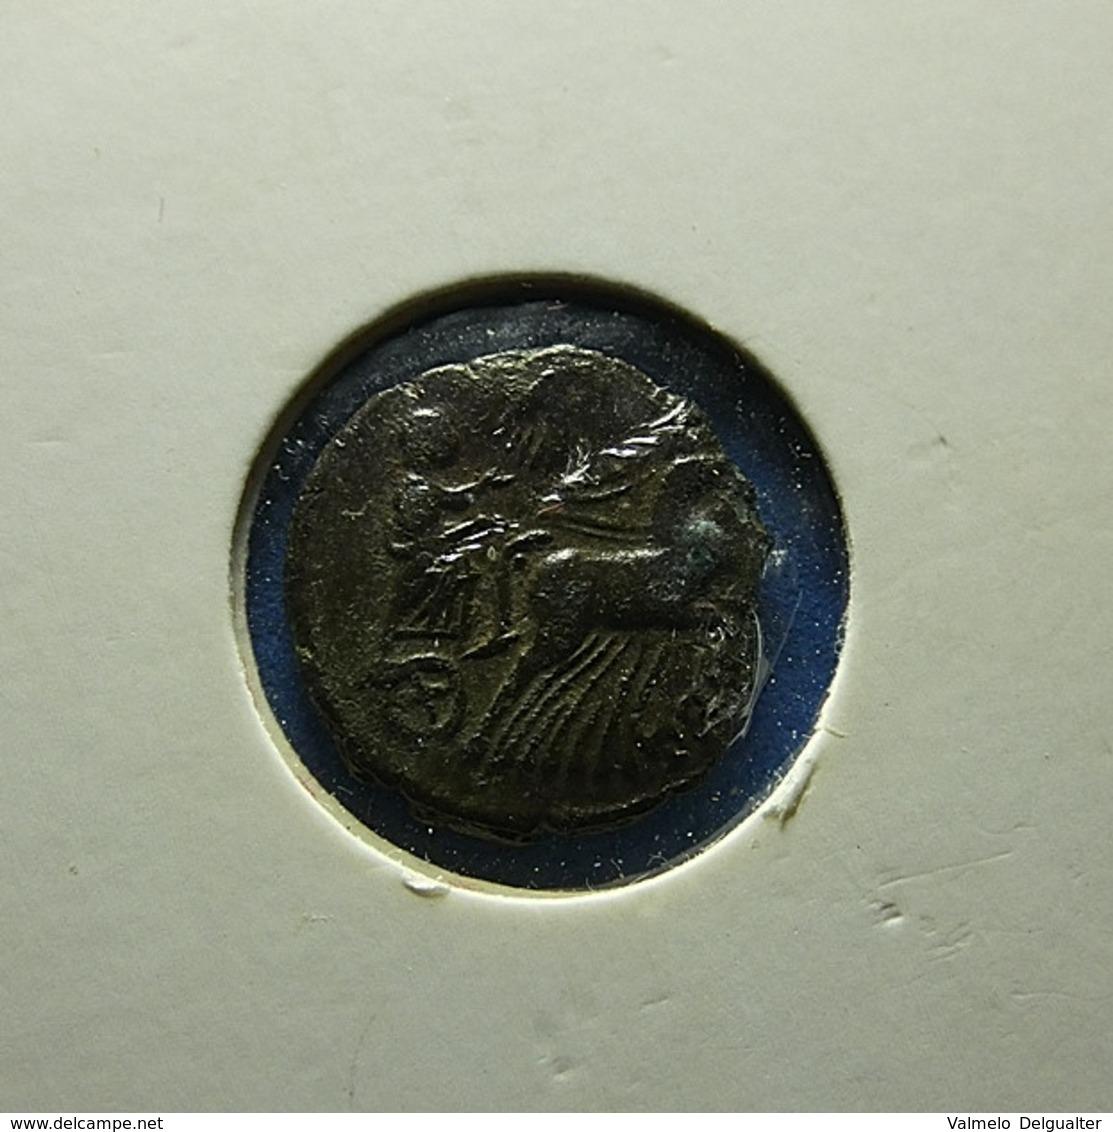 Roman Coin To Identify - Roman